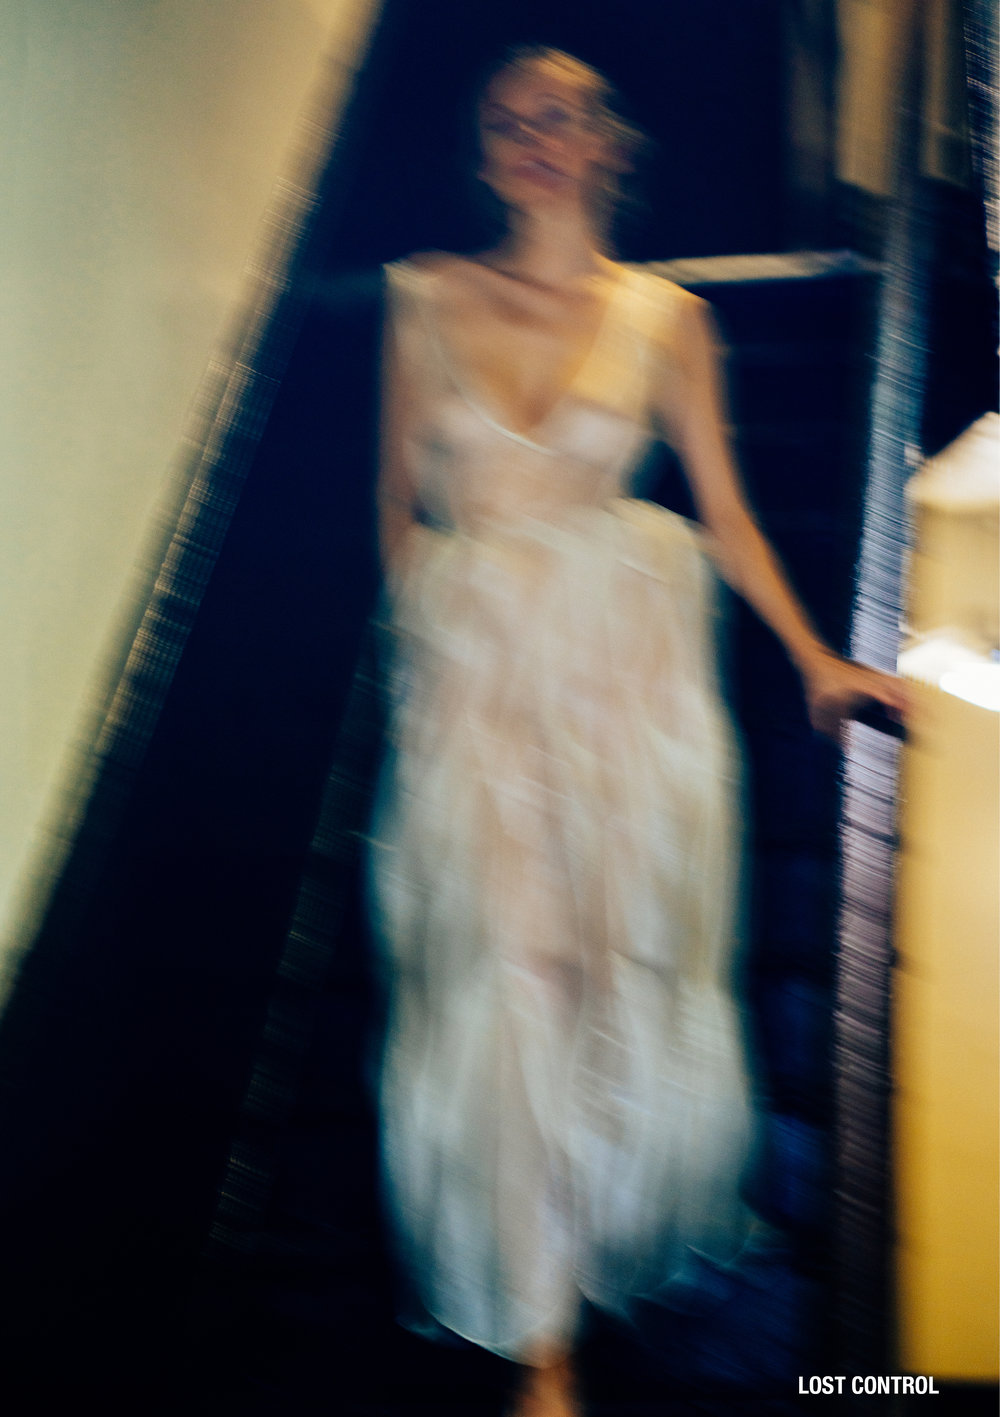 lost control kelsey randall silk organza sheer dress